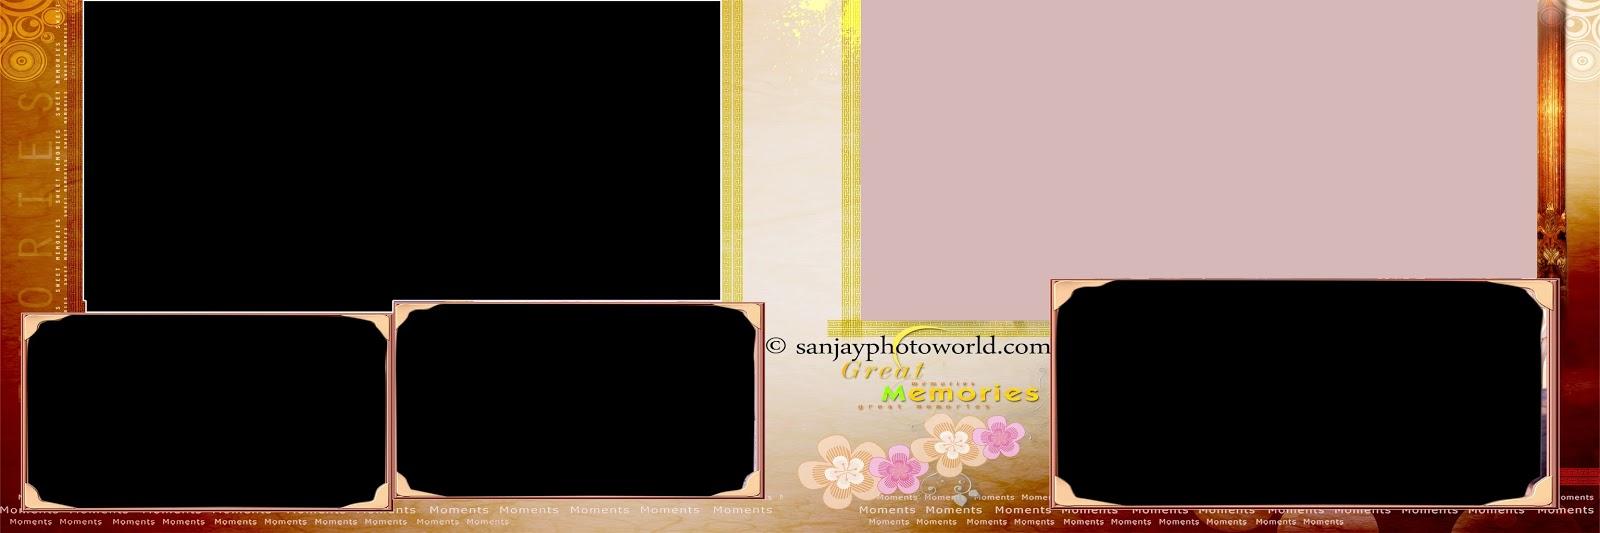 sanjay photo world karizma wedding album designs vol 03